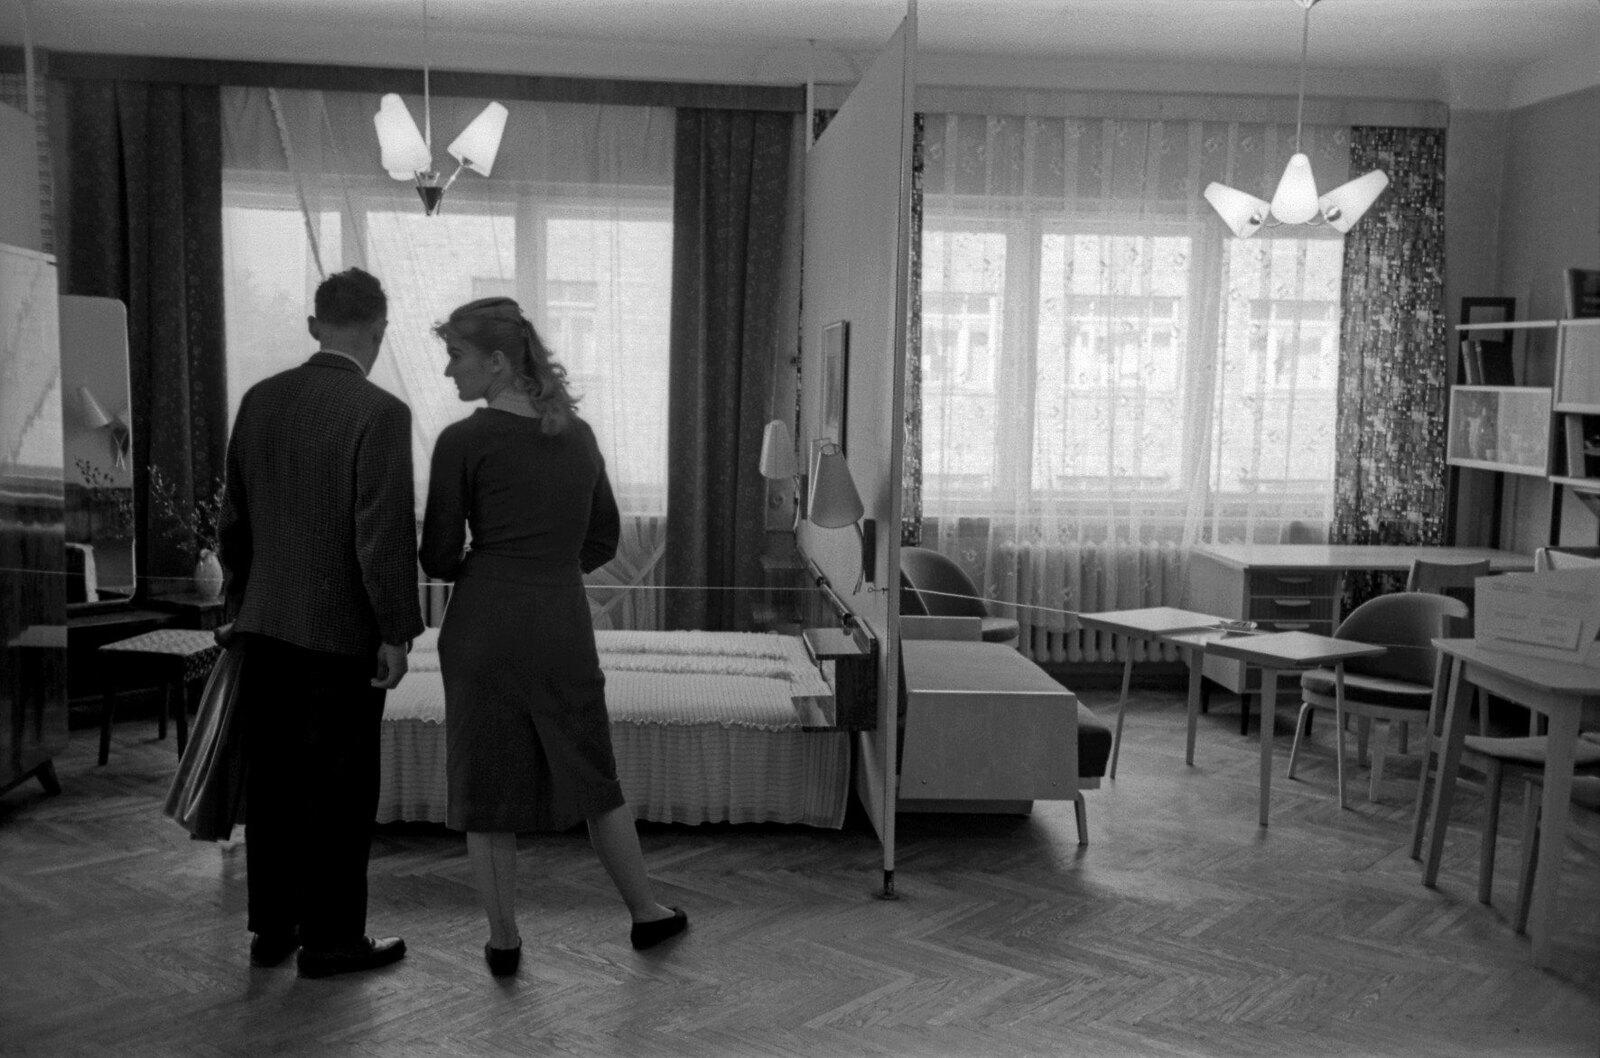 1961. Мечта молодоженов.Латвия